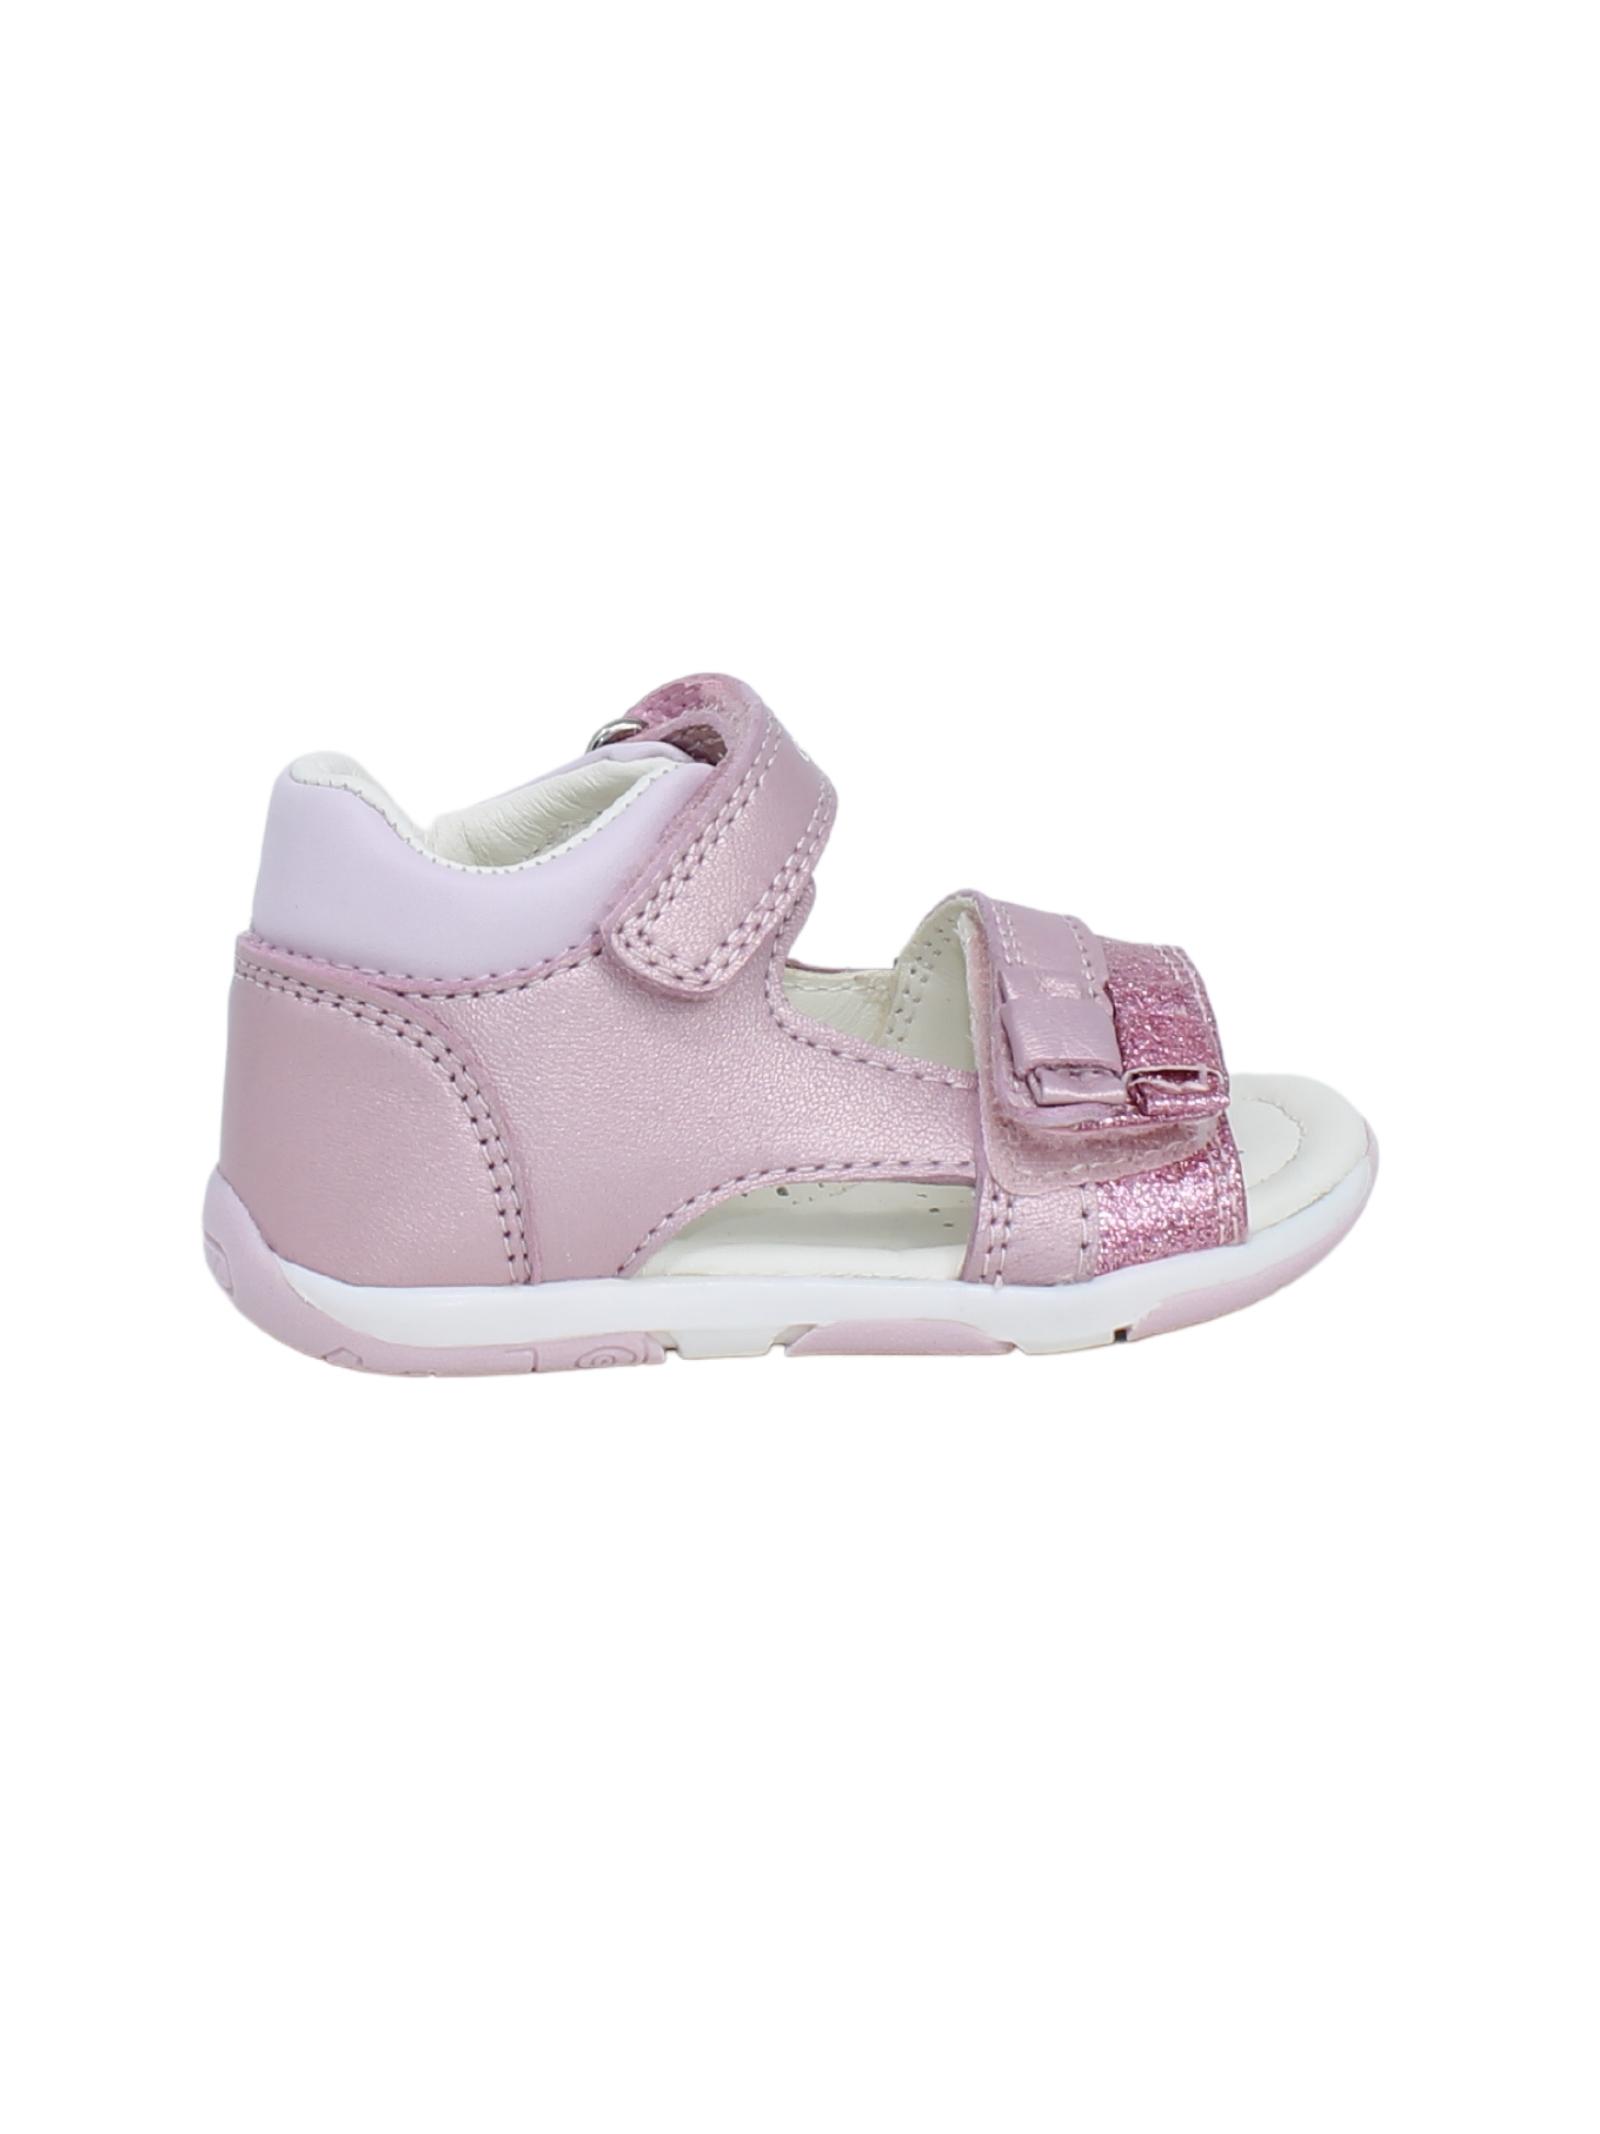 Sandalo Bambina Pink GEOX KIDS | Sandali | B150YB0Y2KCC8010